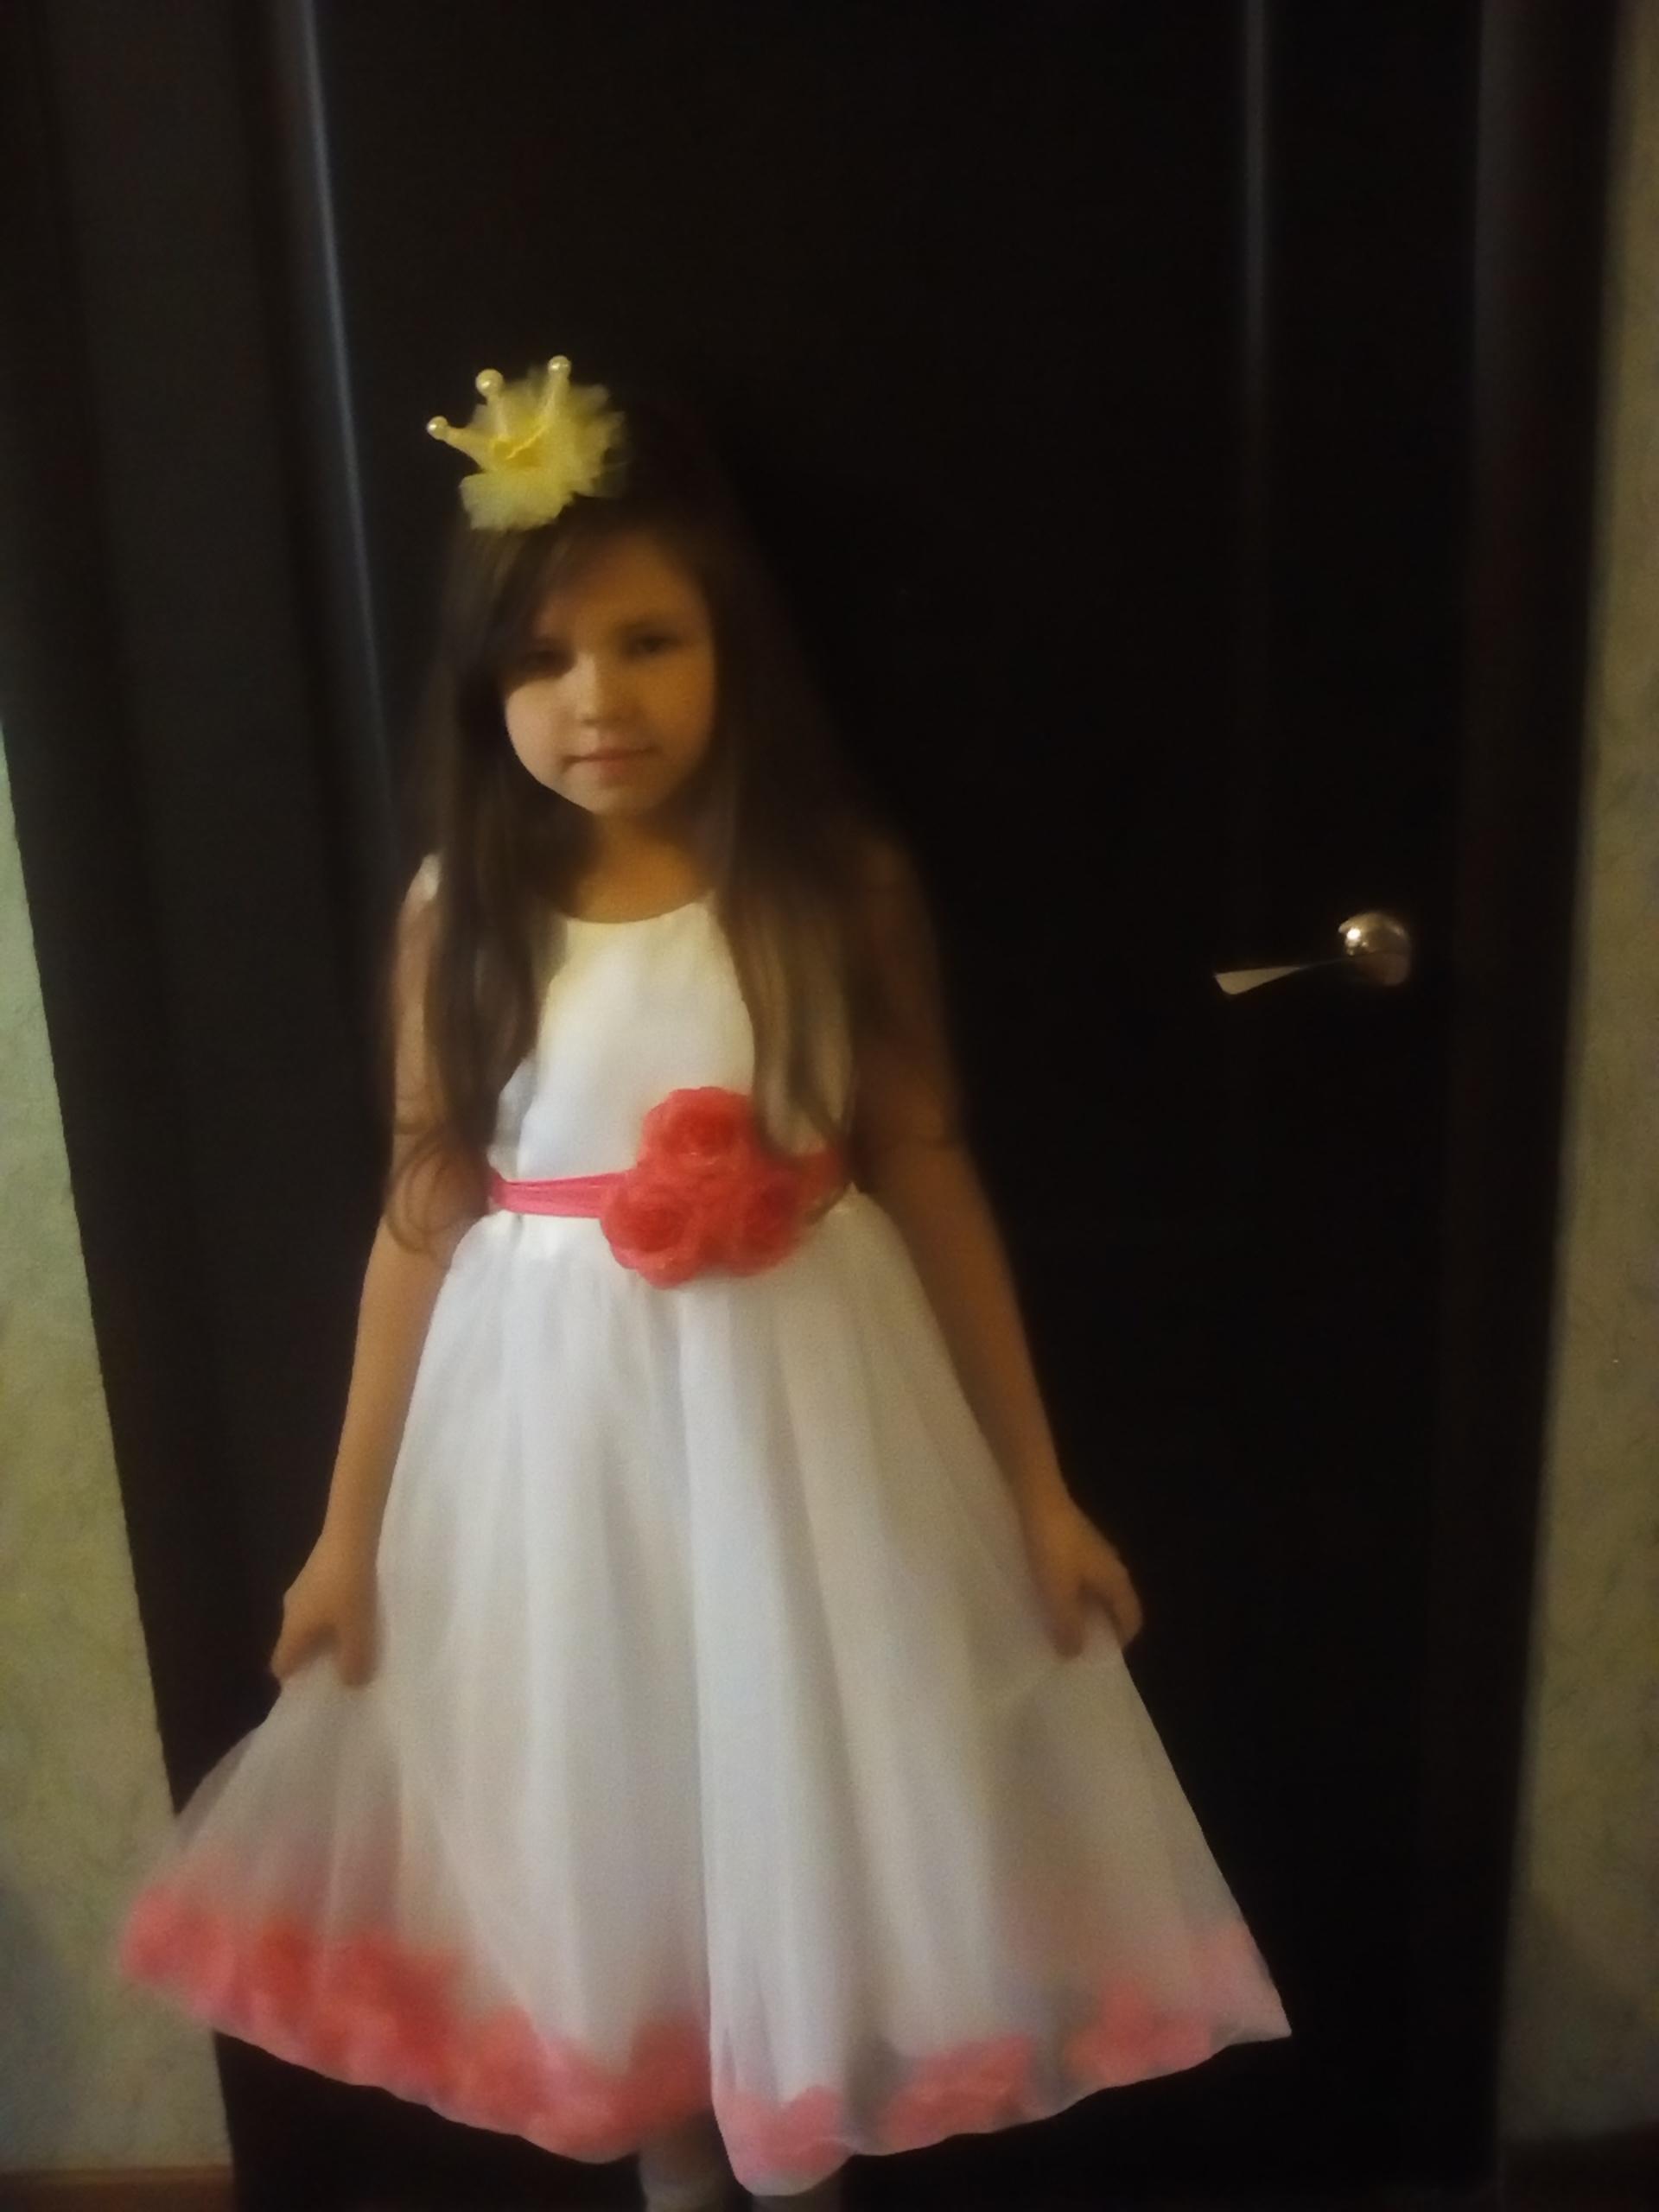 Красавица принцесса. Принцесса собирается на бал